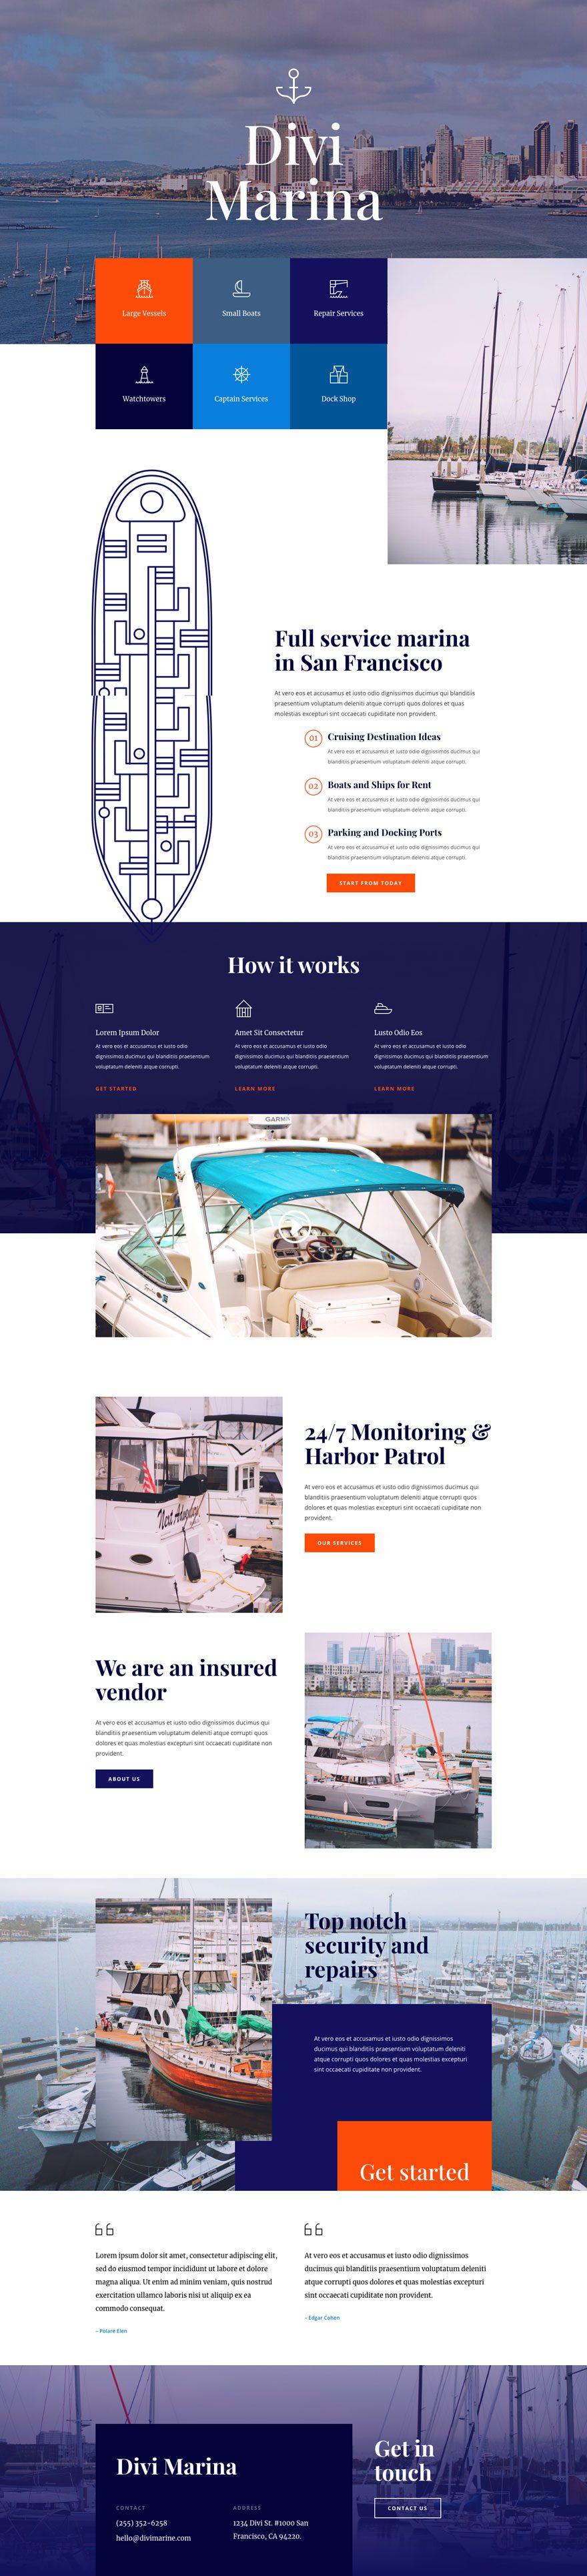 divi marina layout pack